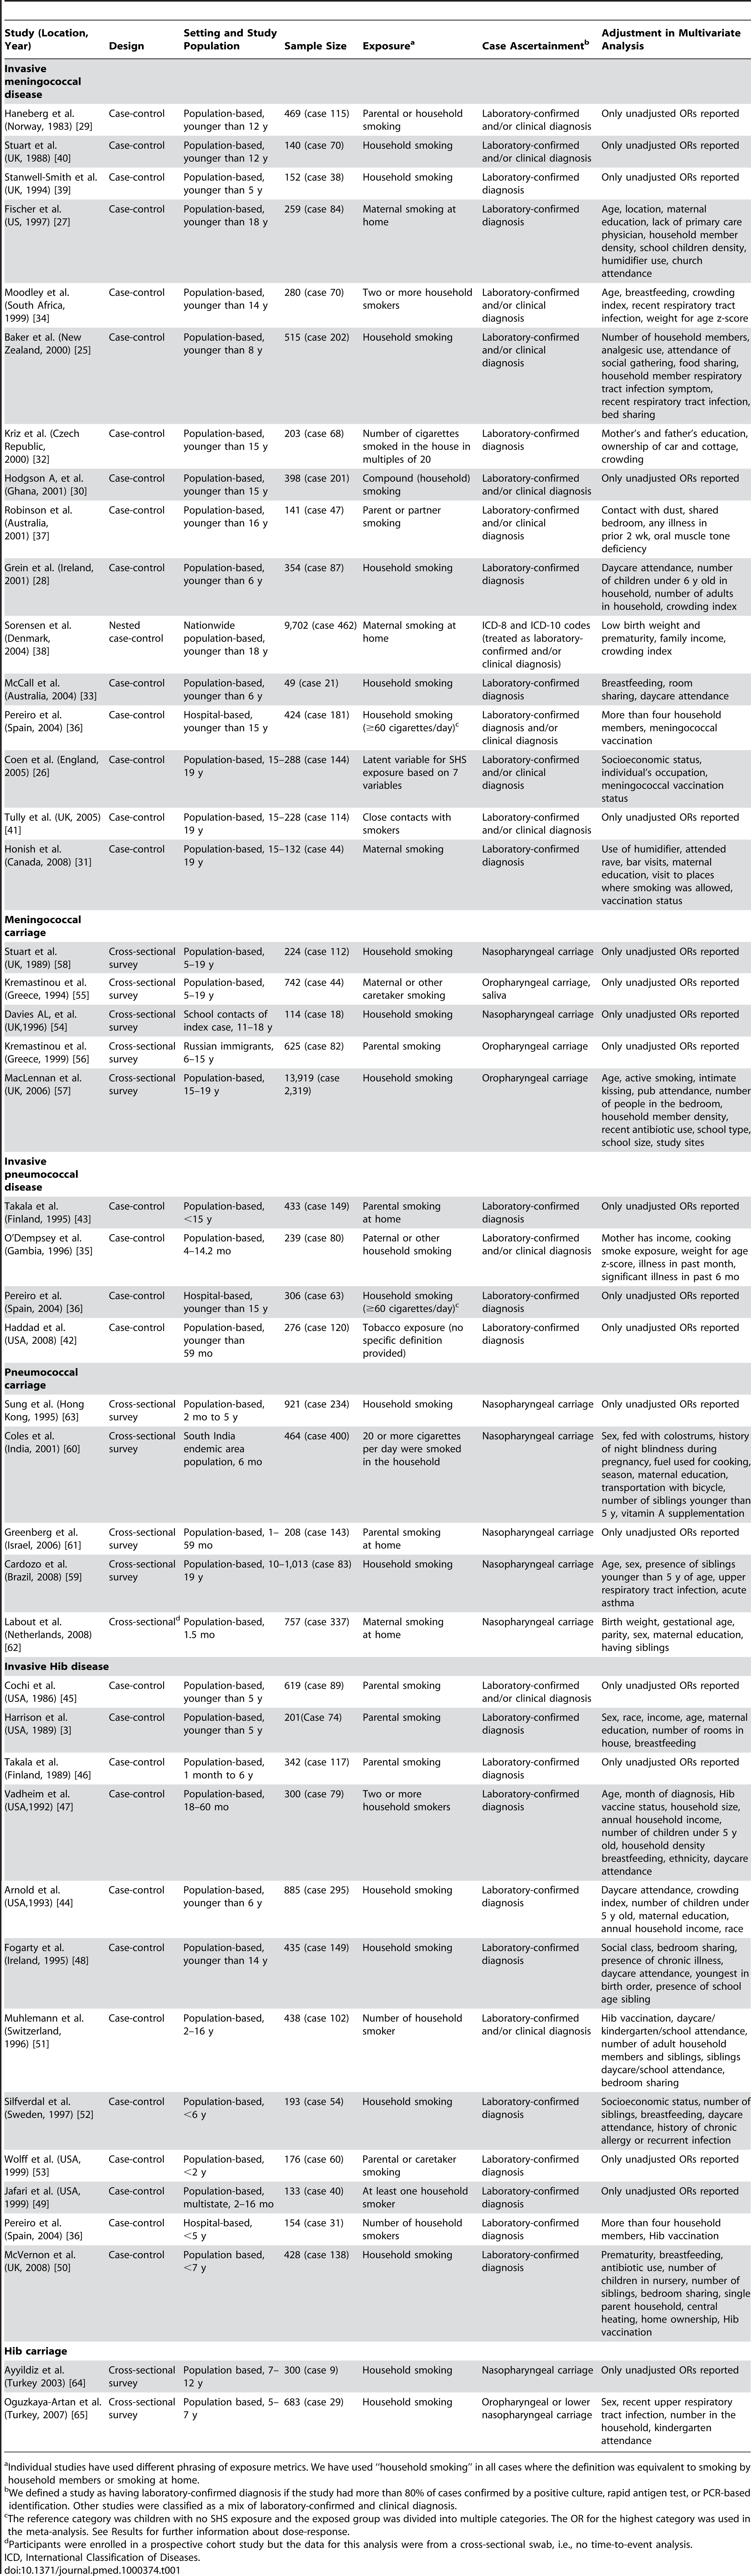 Summary of studies of the association between SHS exposure and IBD or pharyngeal bacterial carriage.